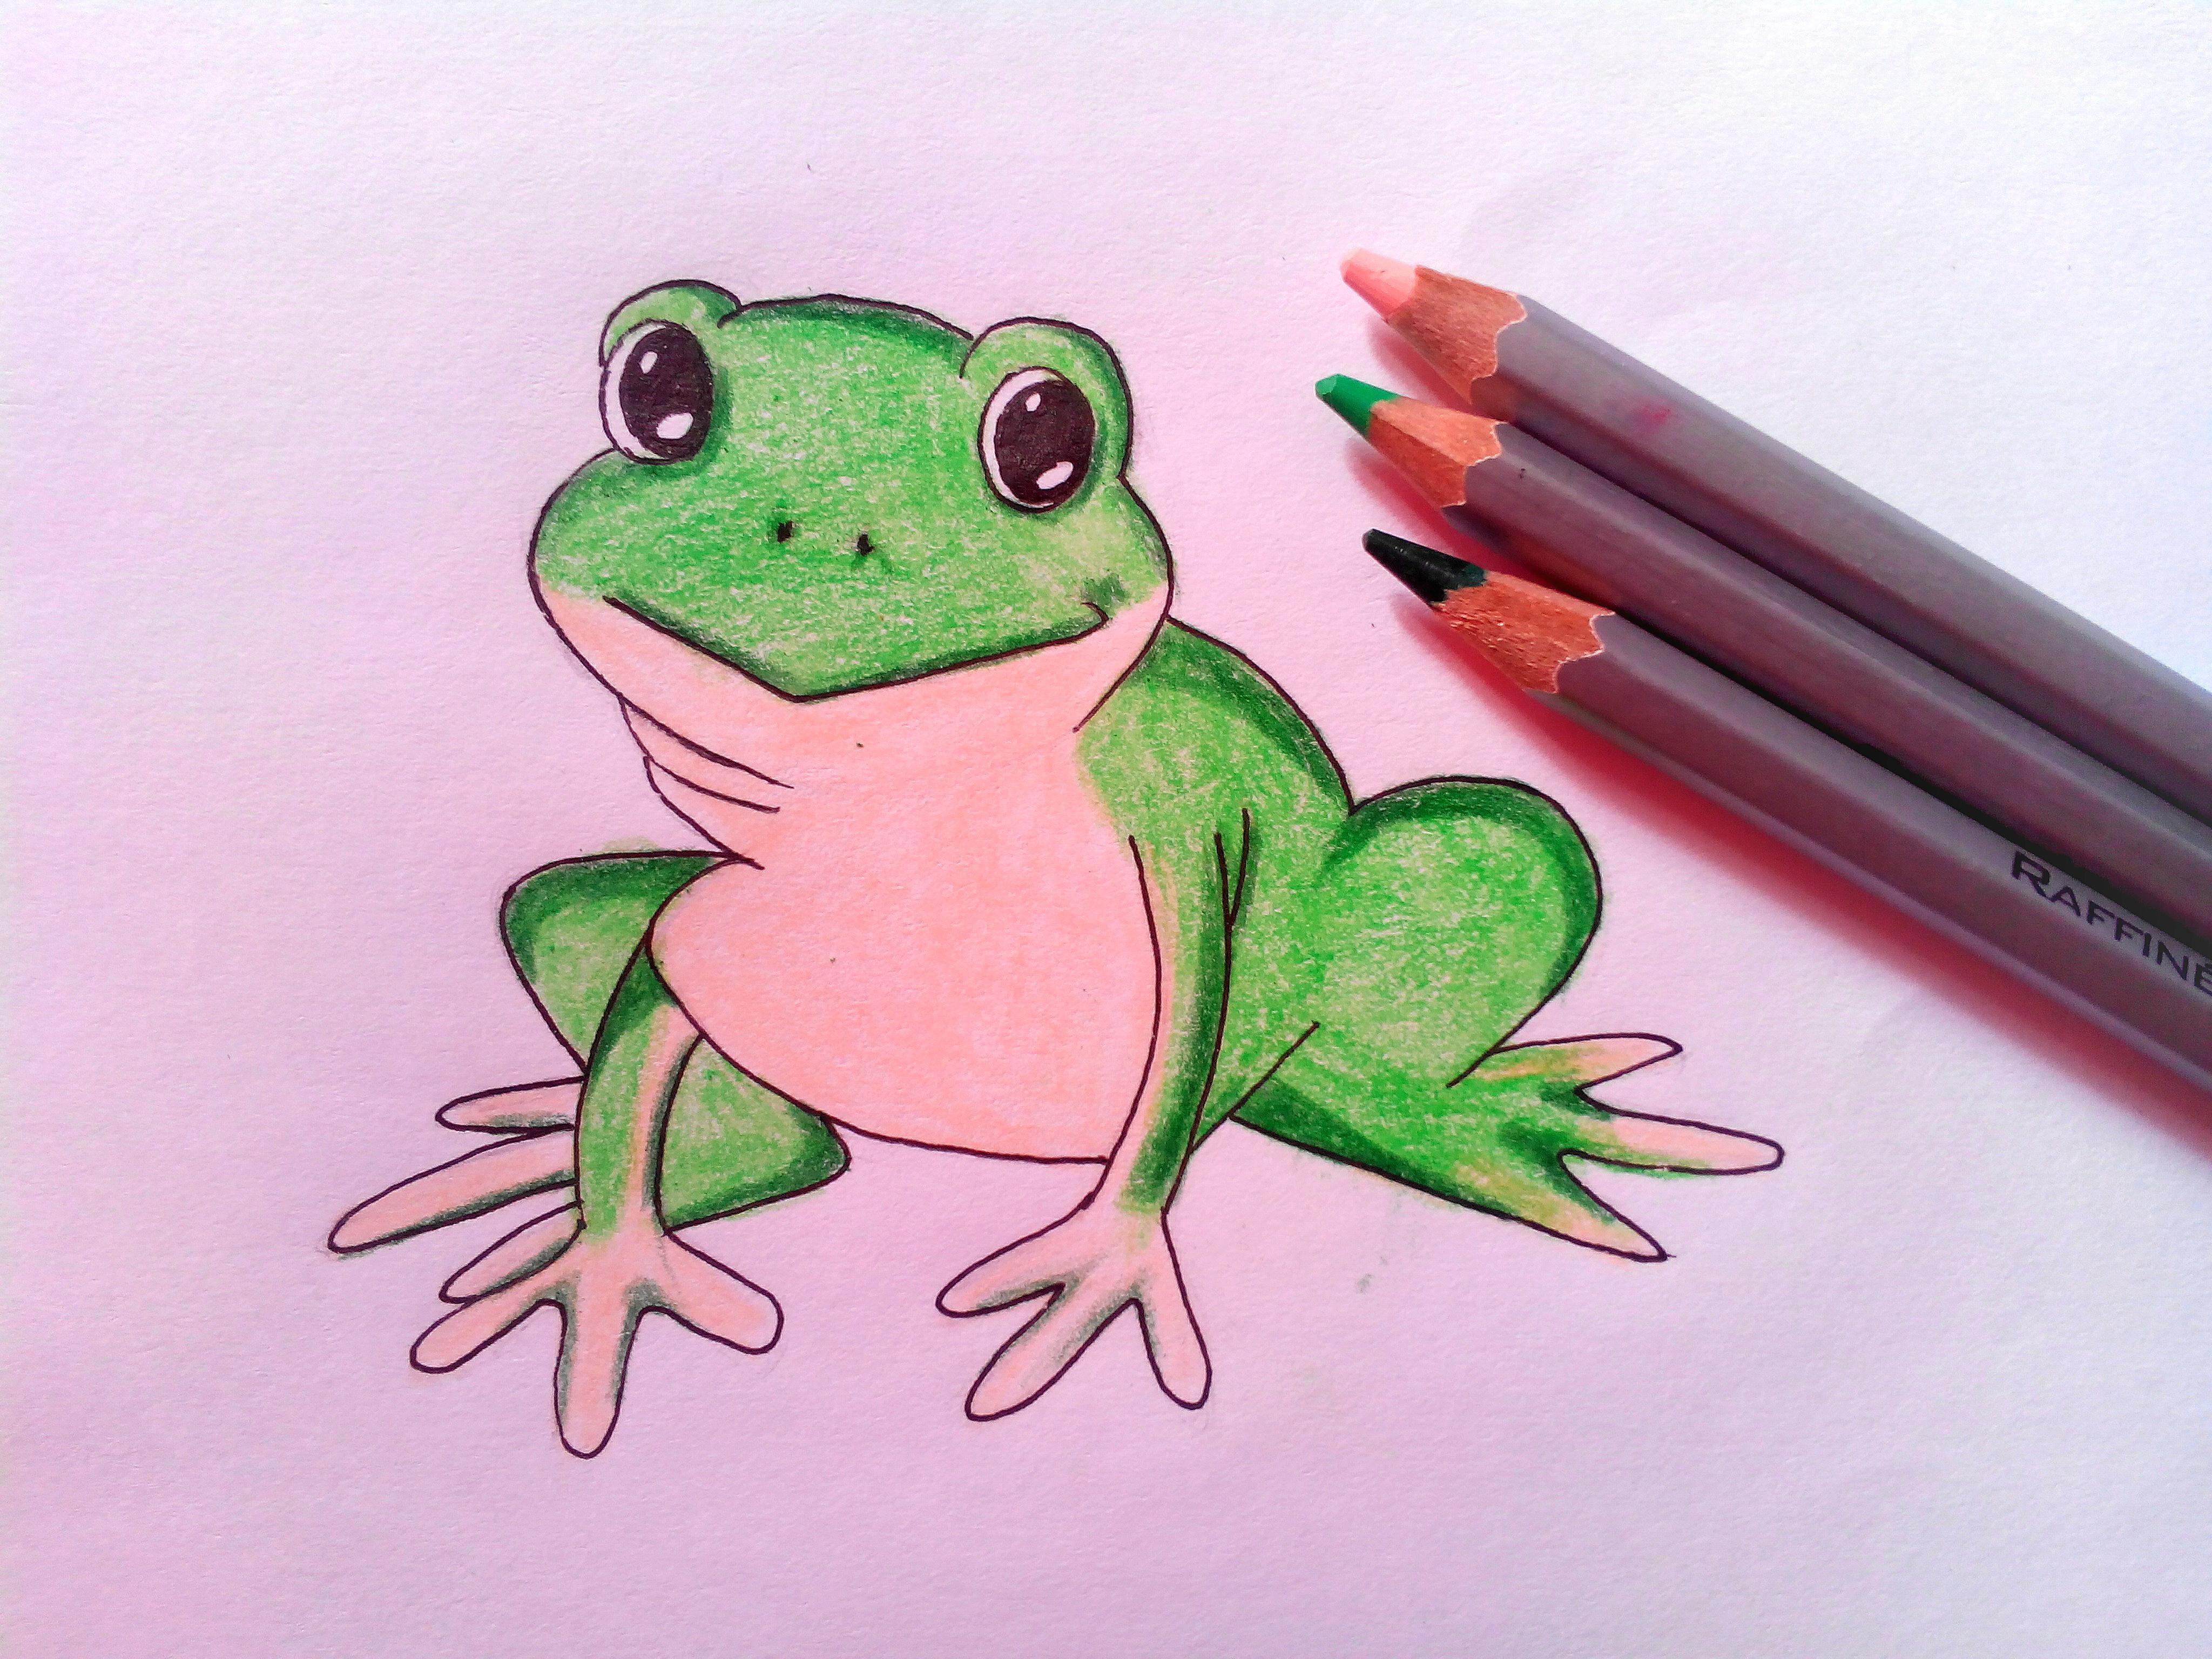 Как нарисовать жабу карандашом поэтапно?